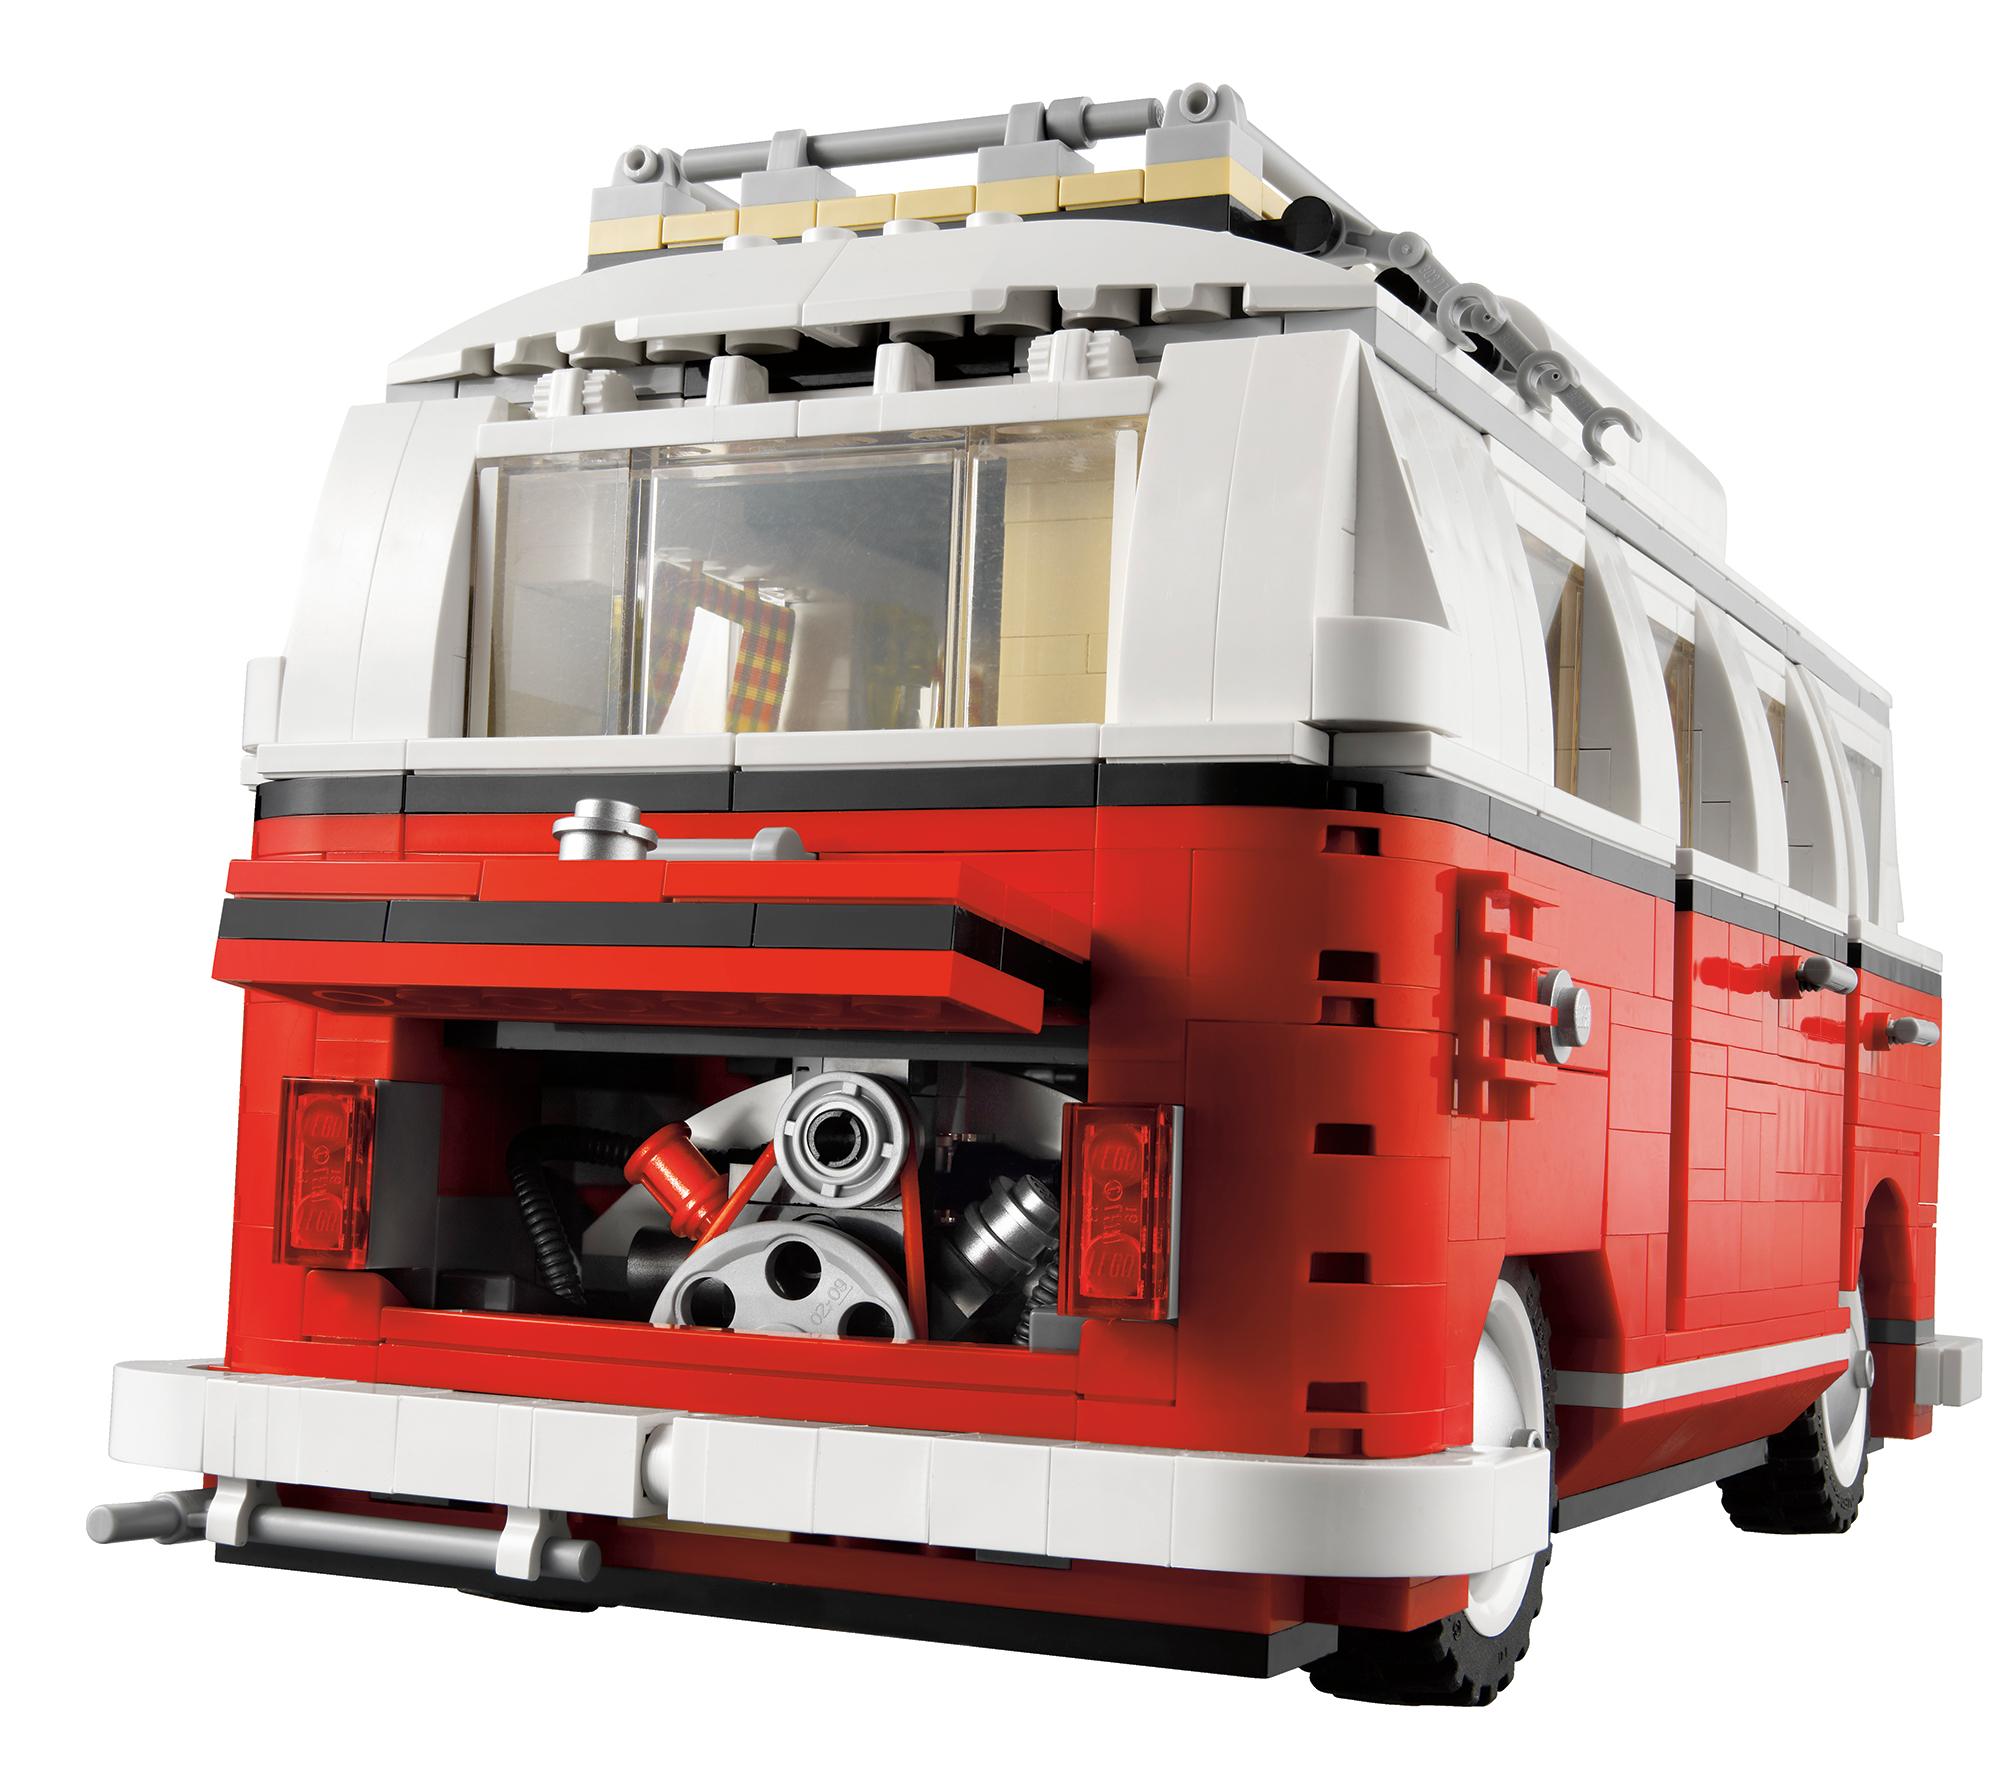 lego s 10220 volkswagen t1 camper van due in october 2011. Black Bedroom Furniture Sets. Home Design Ideas